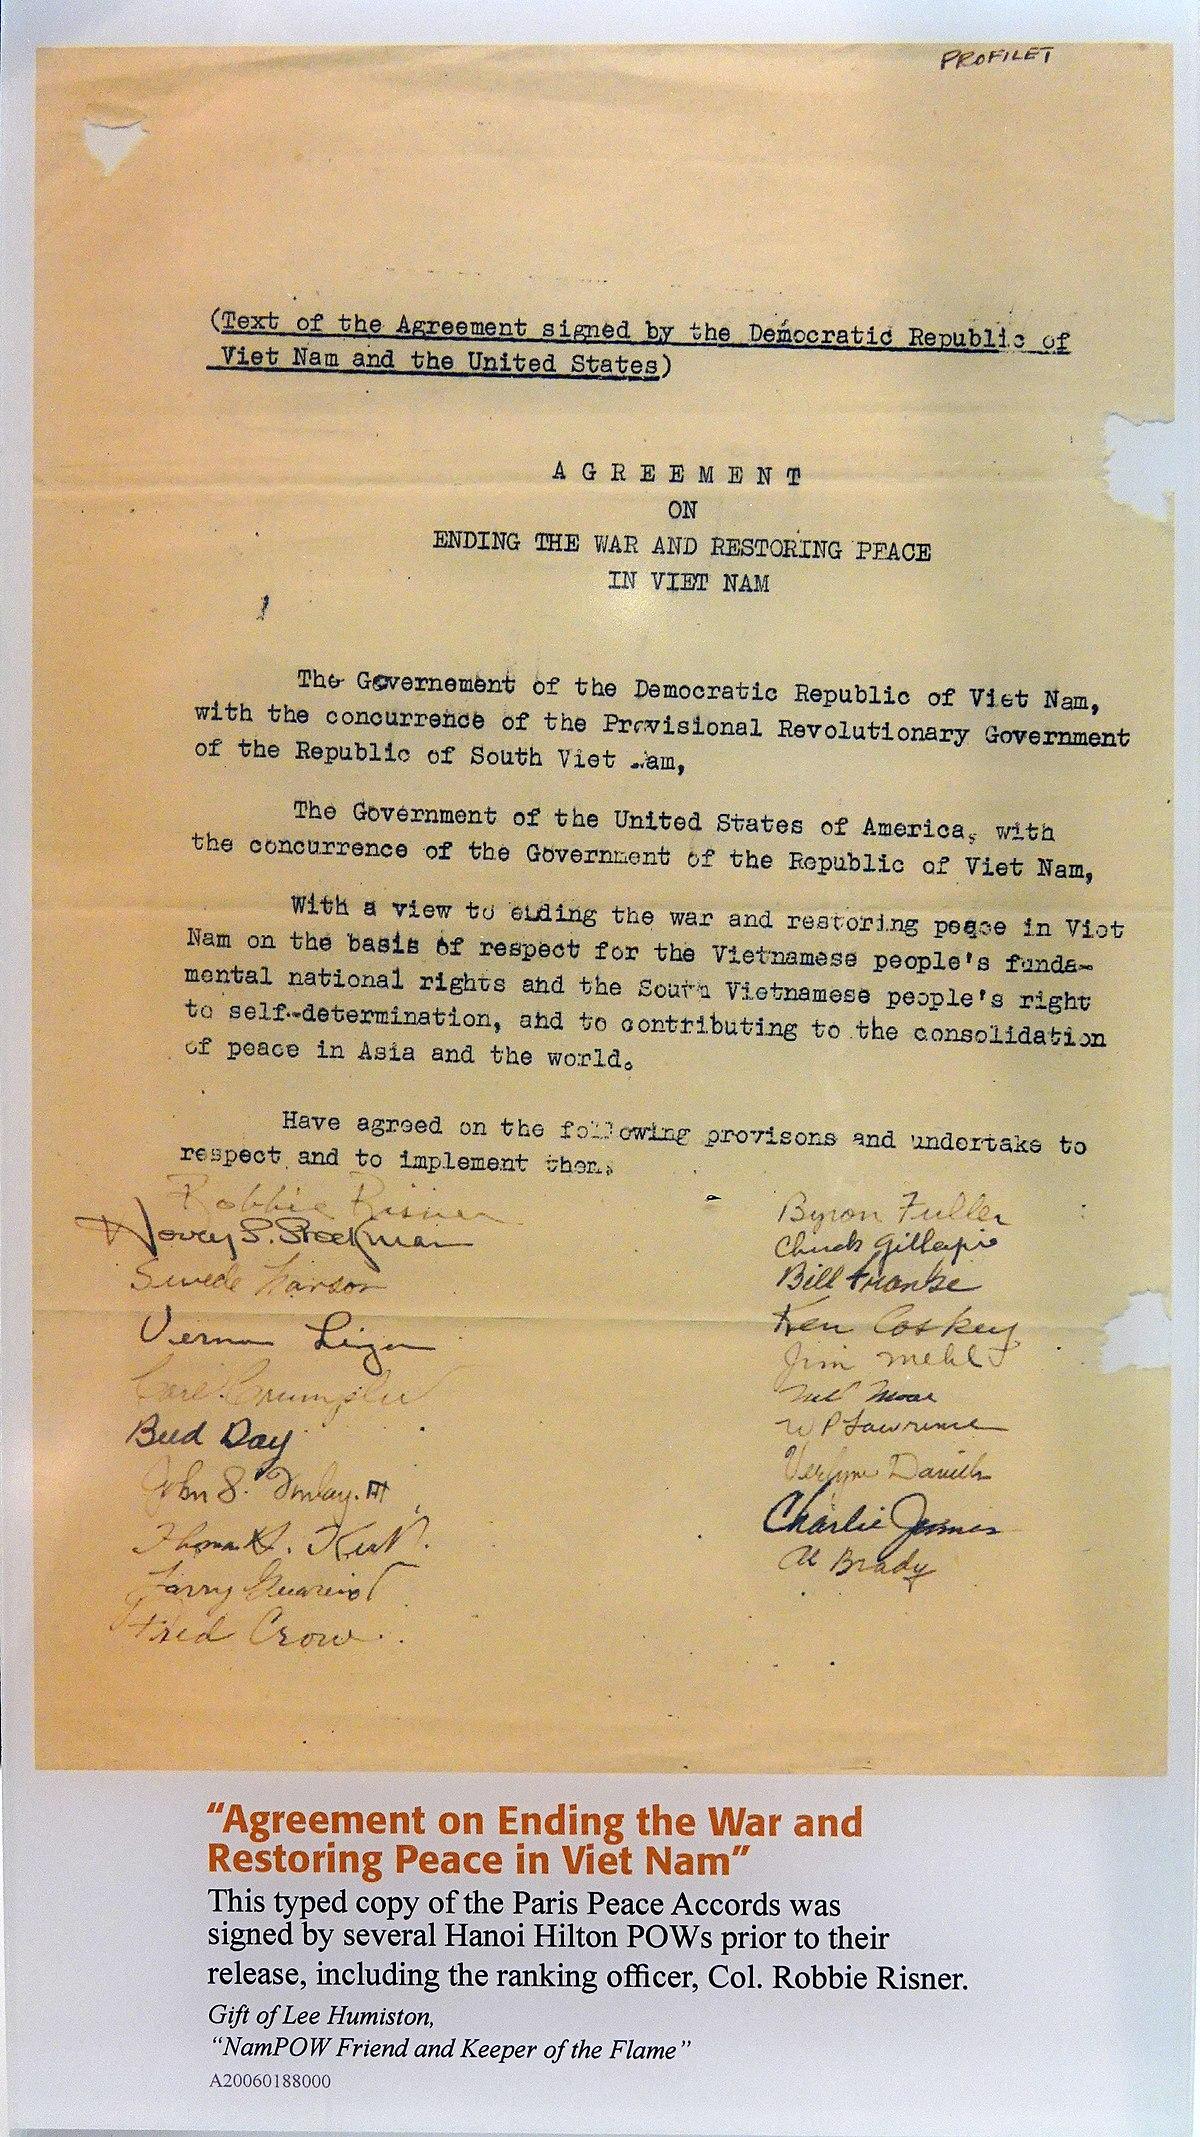 Paris Peace Accords - Wikipedia